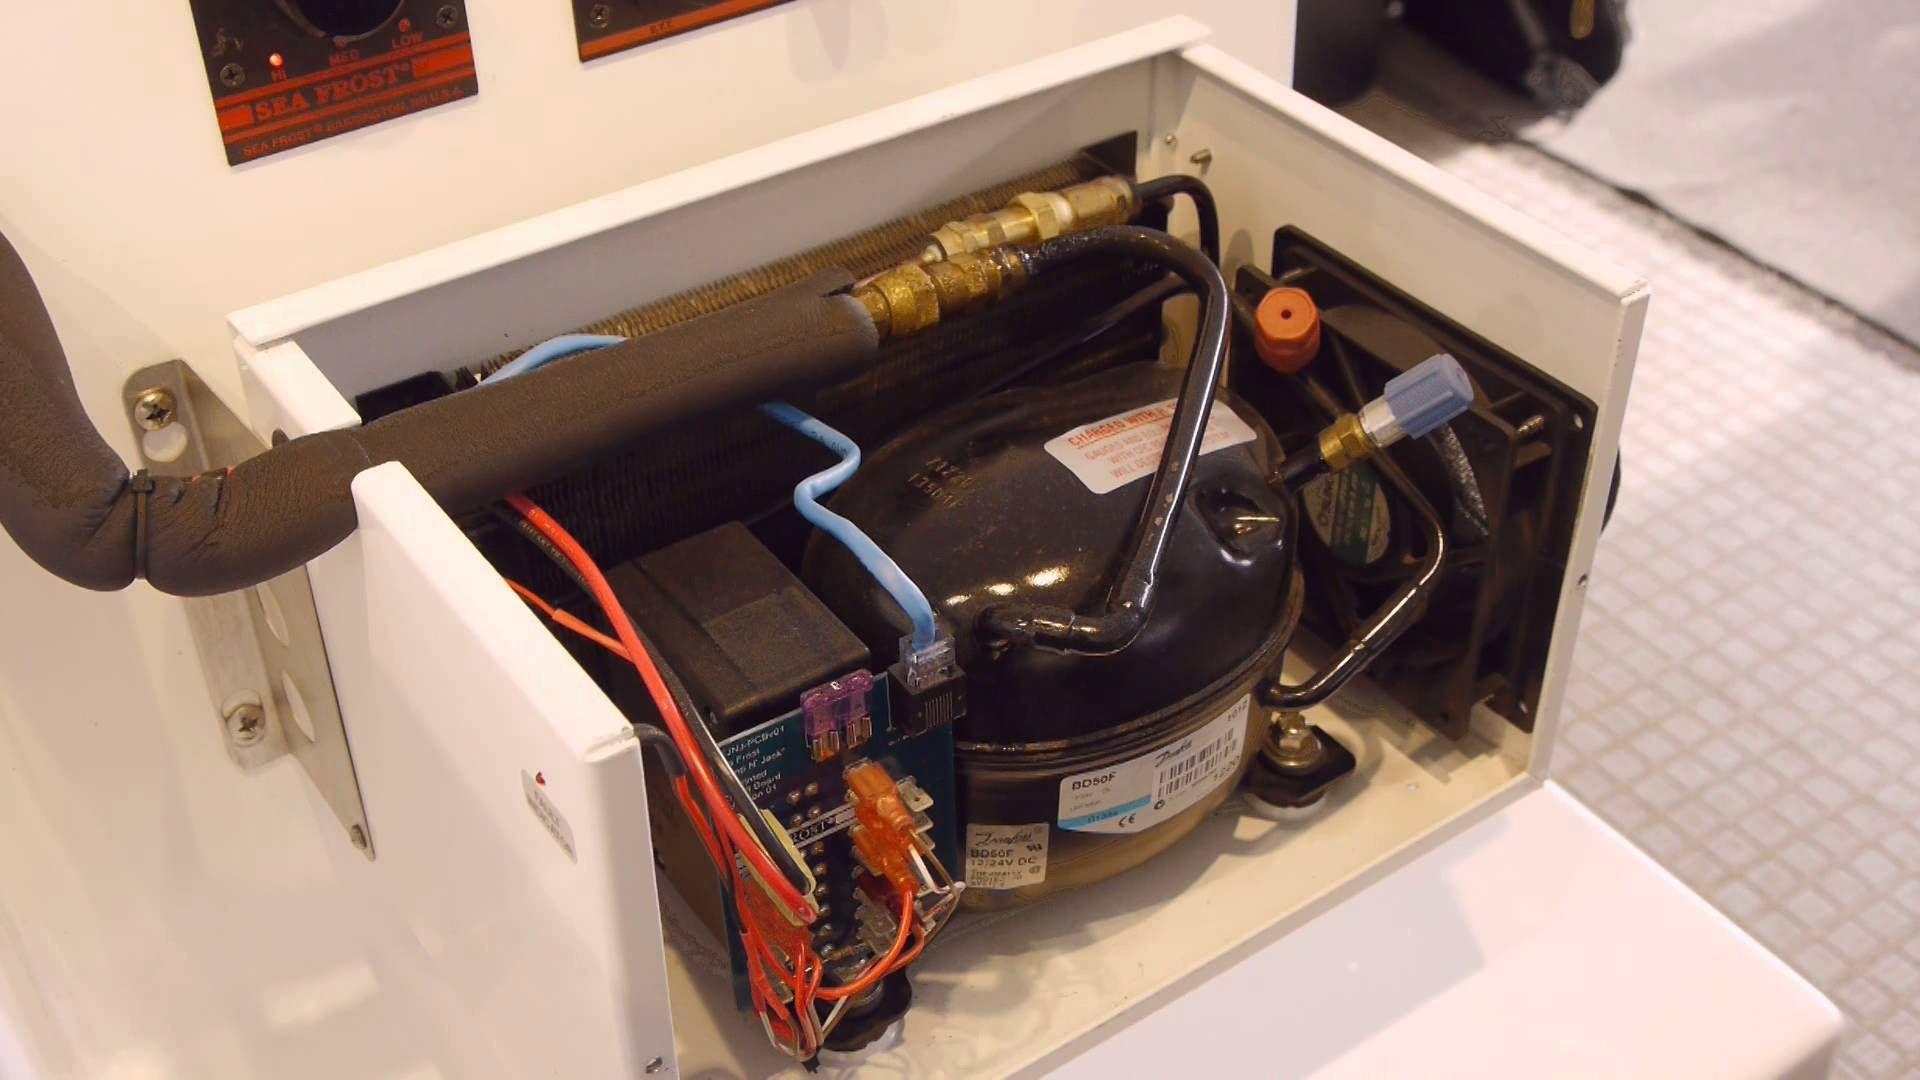 Seafrost 12 Volt Bd Marine Refrigeration Systems Bar Sink Under Counter Fridge Boat Building